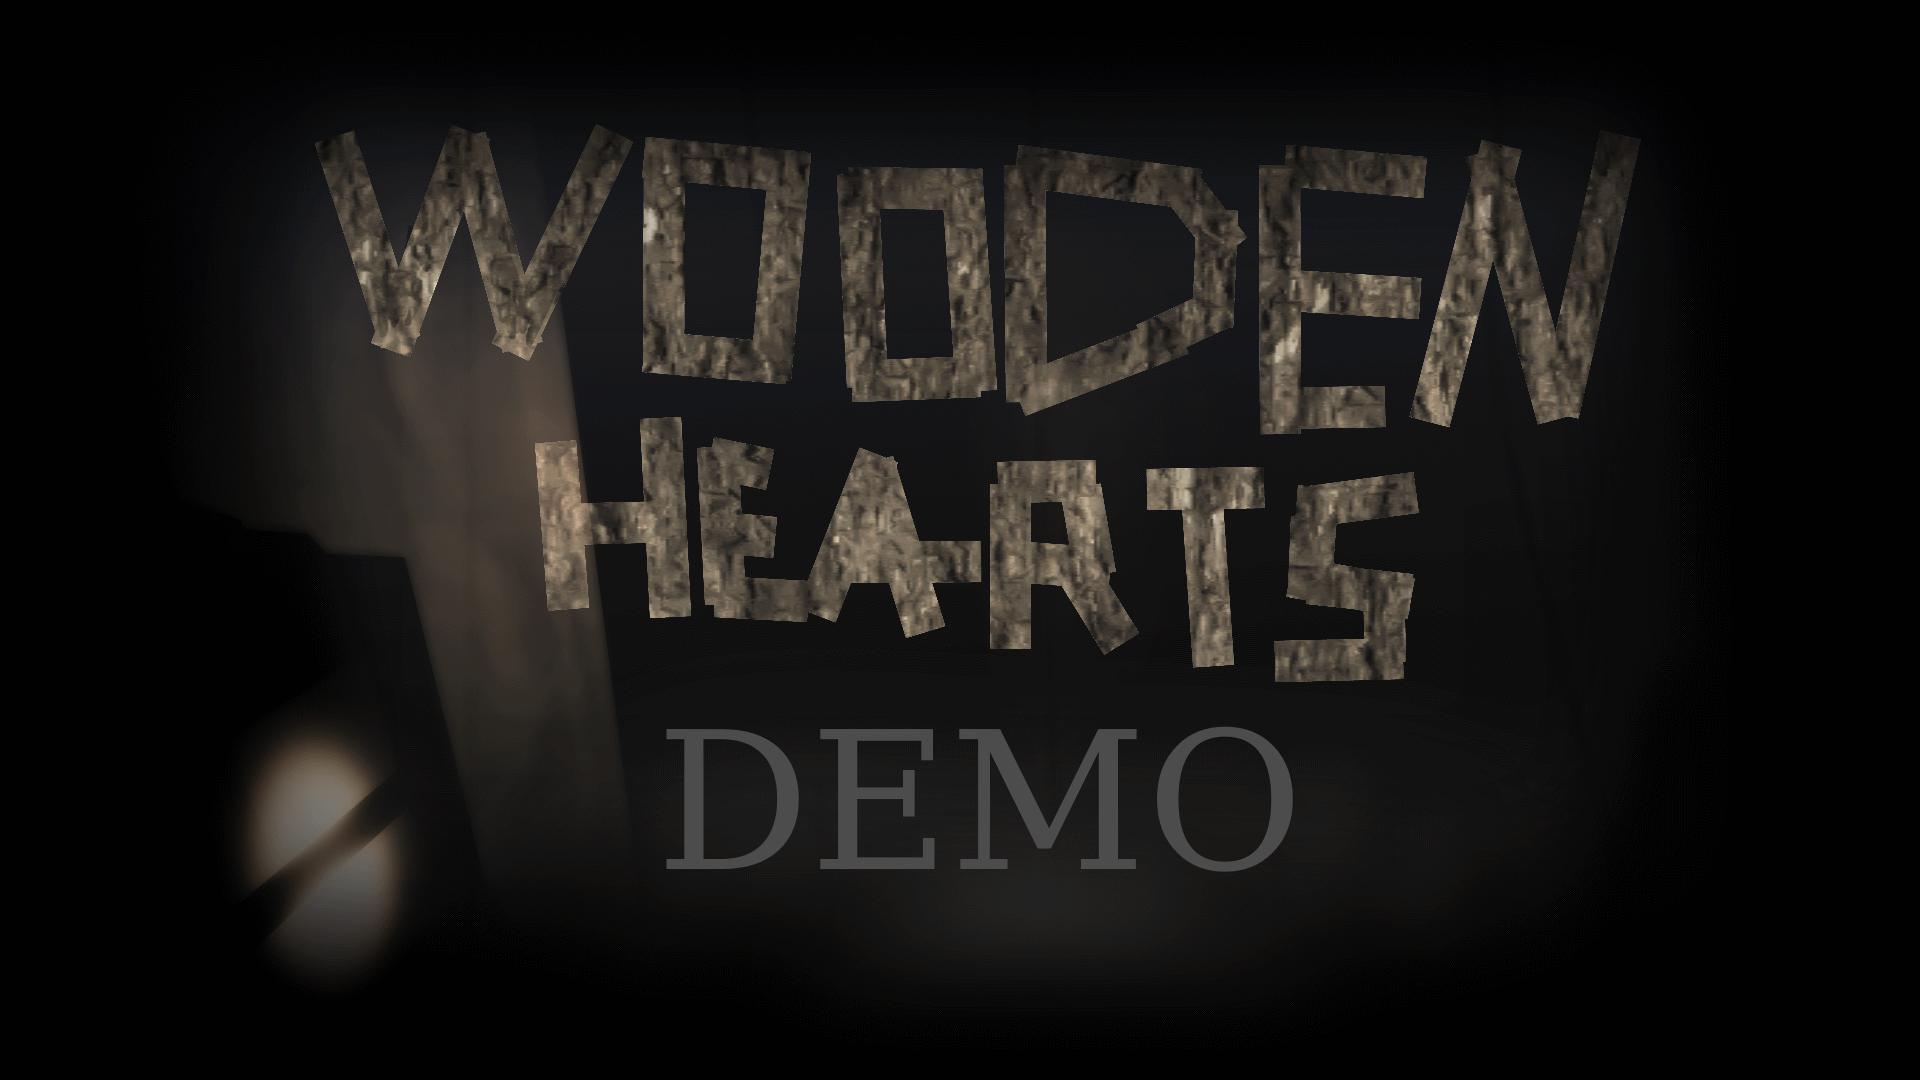 Wooden Hearts DEMO (Scream Jam 2019 version)